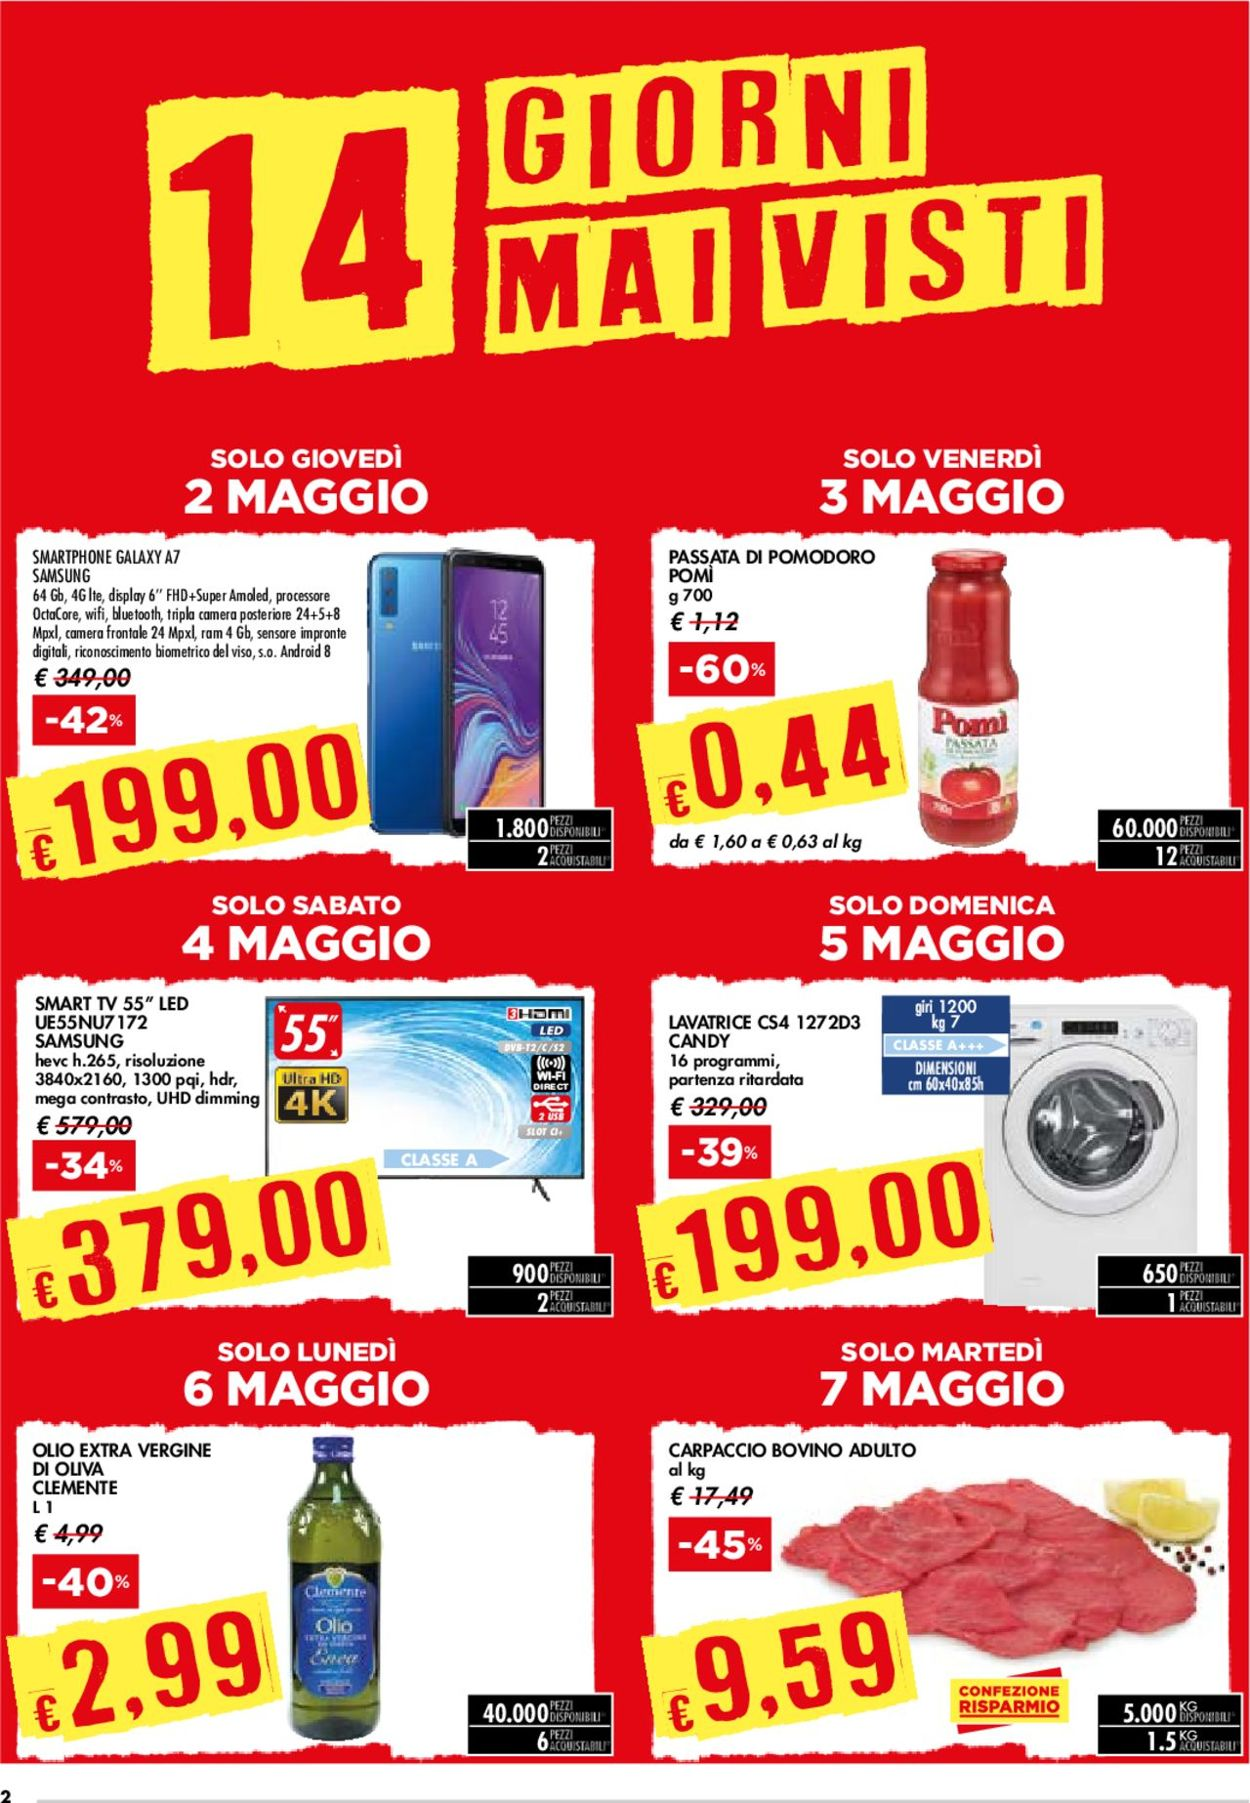 Volantino bennet - Offerte 02/05-15/05/2019 (Pagina 2)